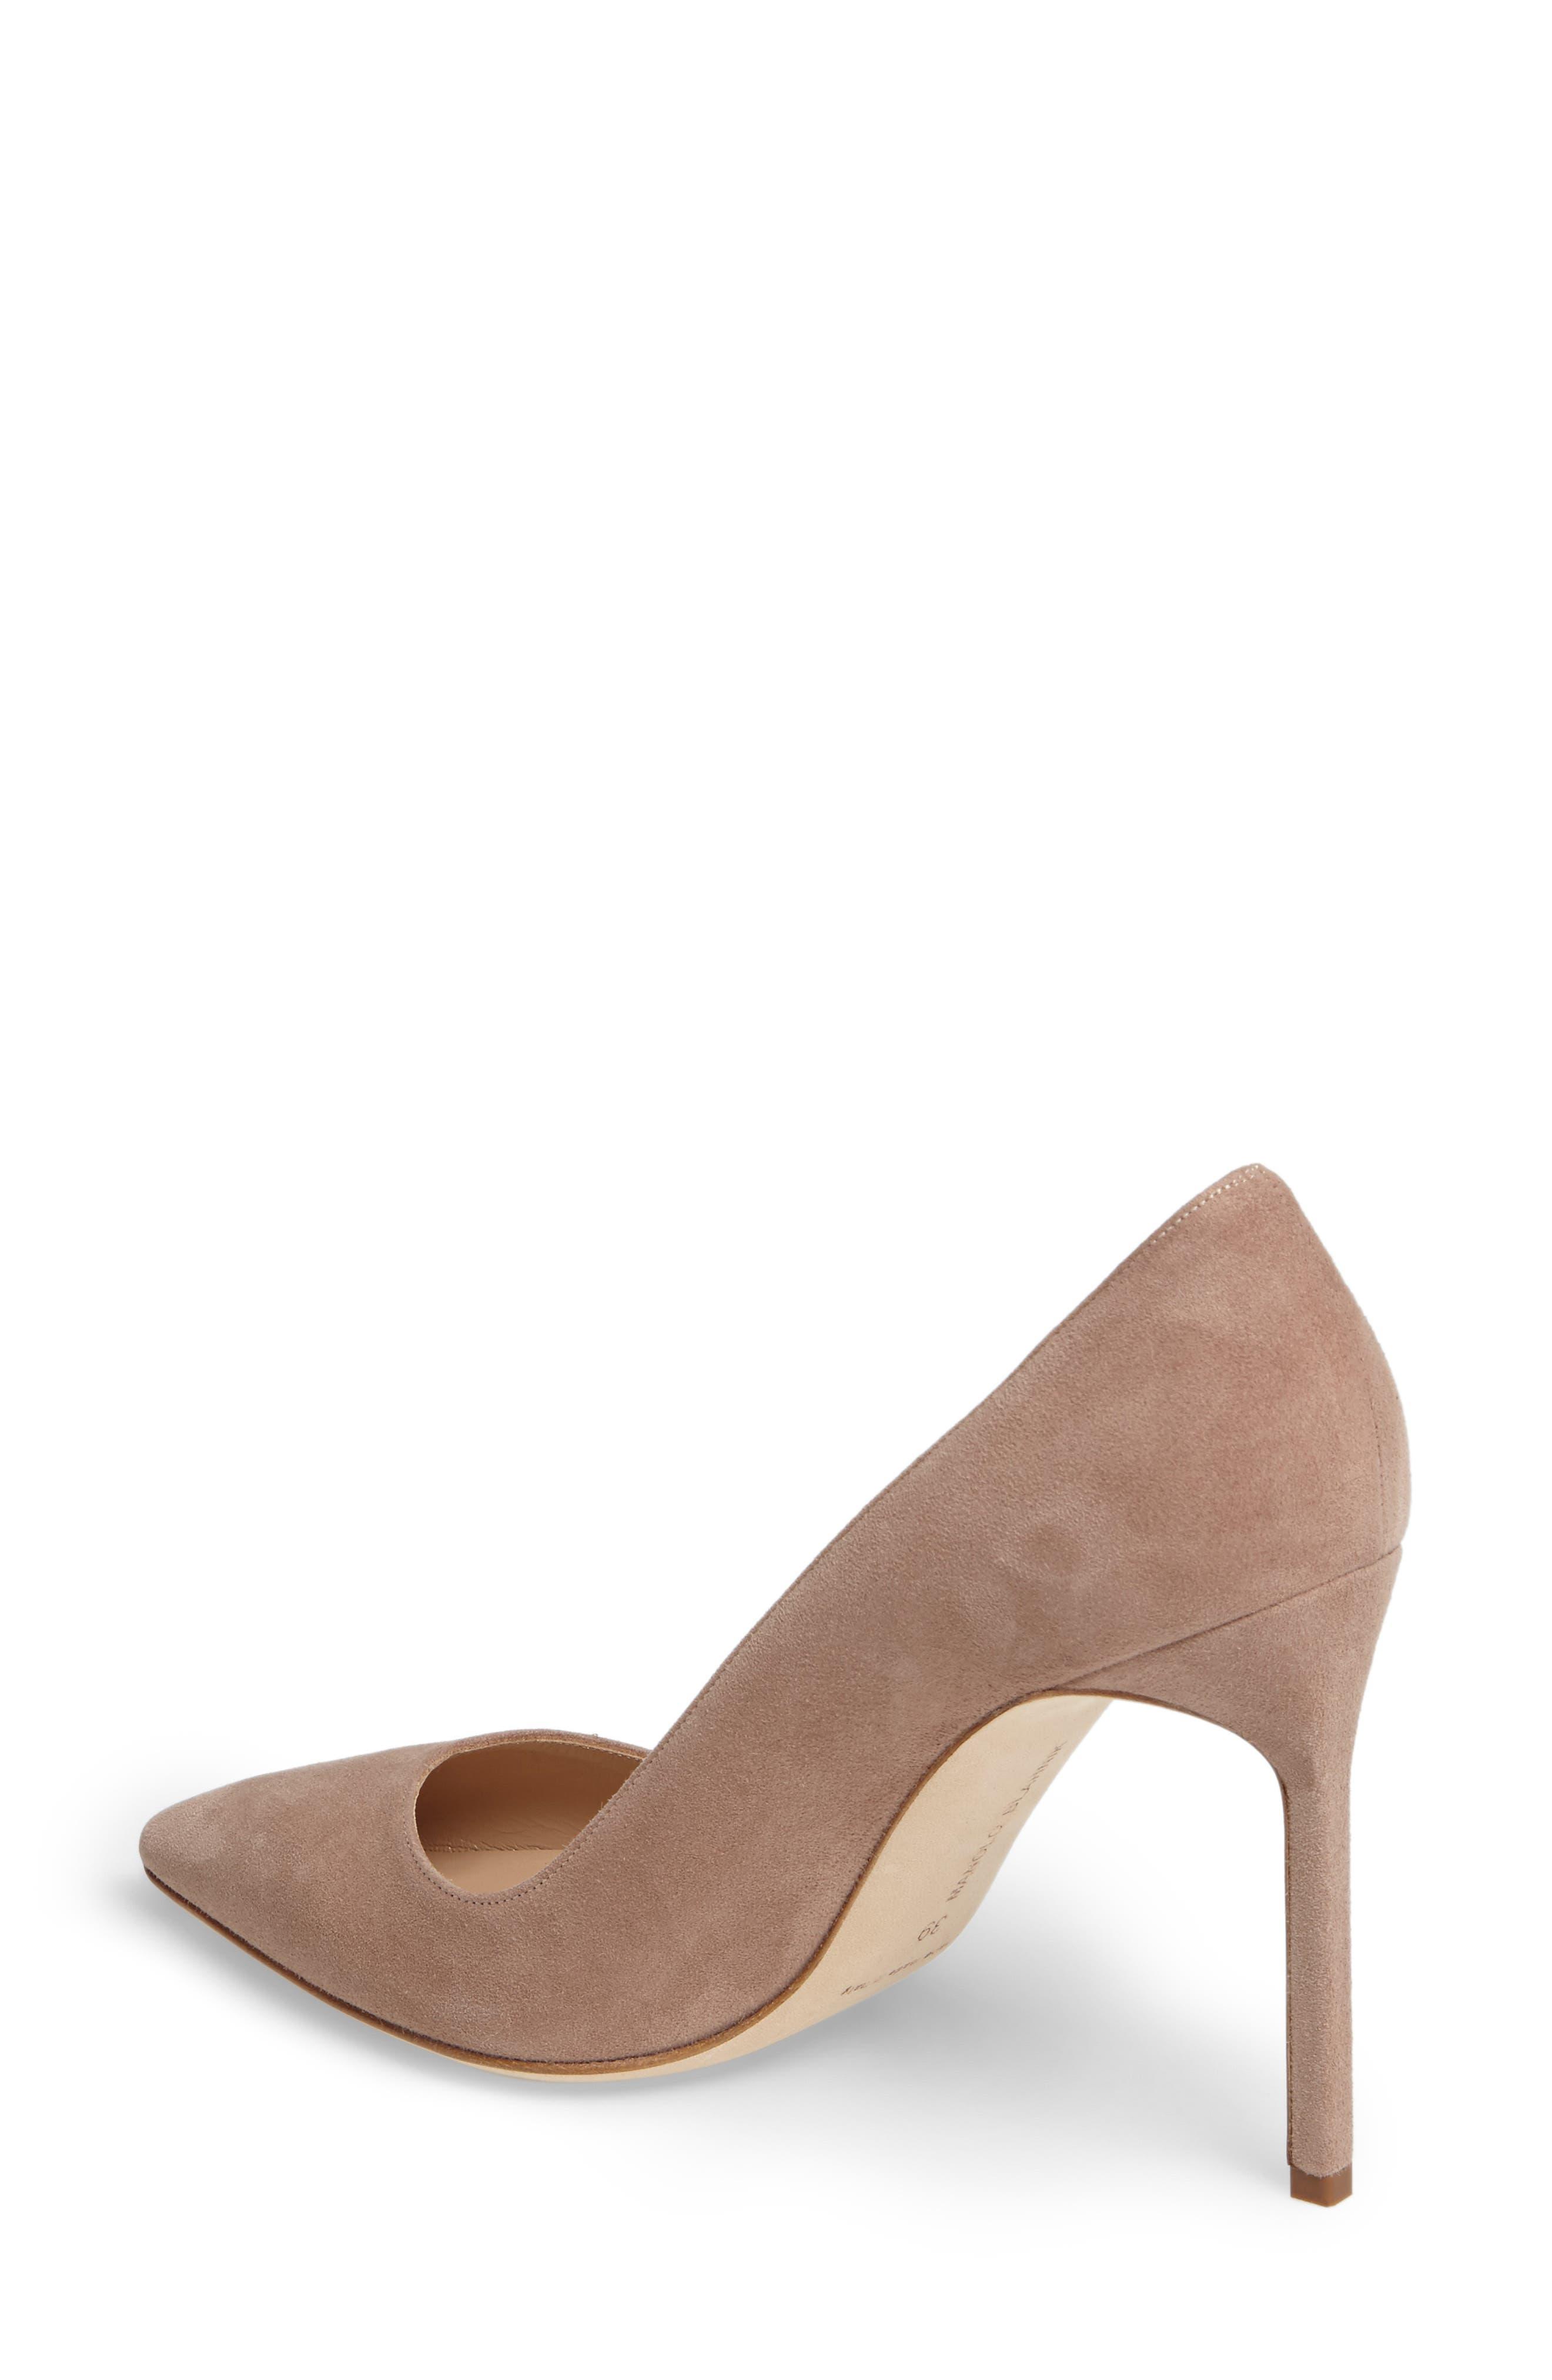 739153e7dd02 Women s Pink Heels